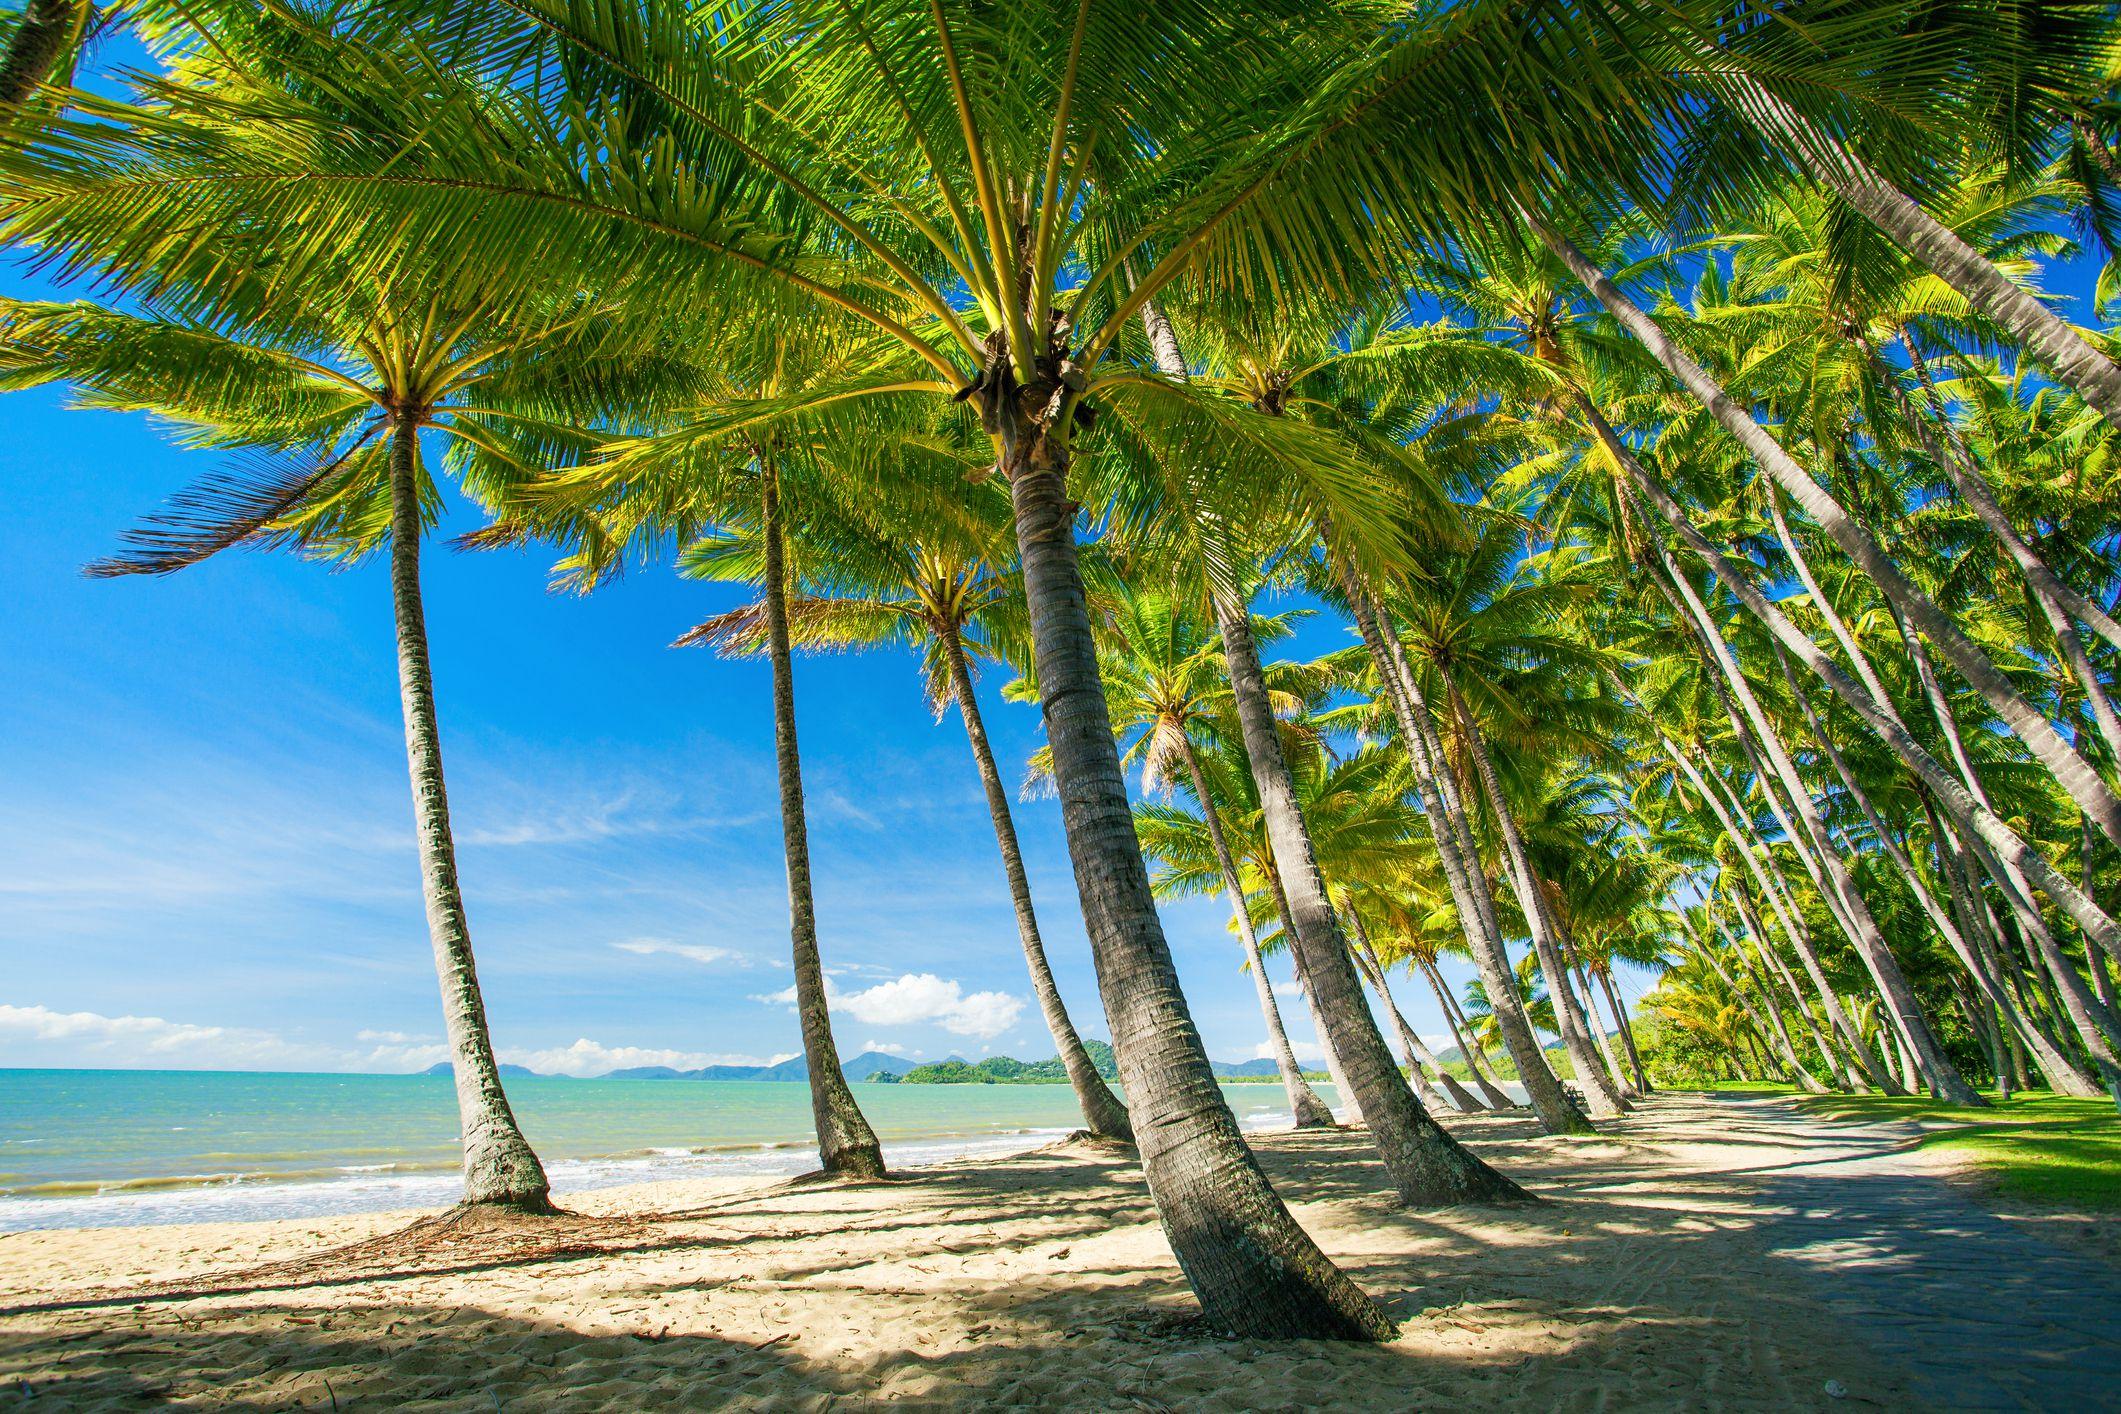 Palmeras en la playa de Palm Cove en Australia